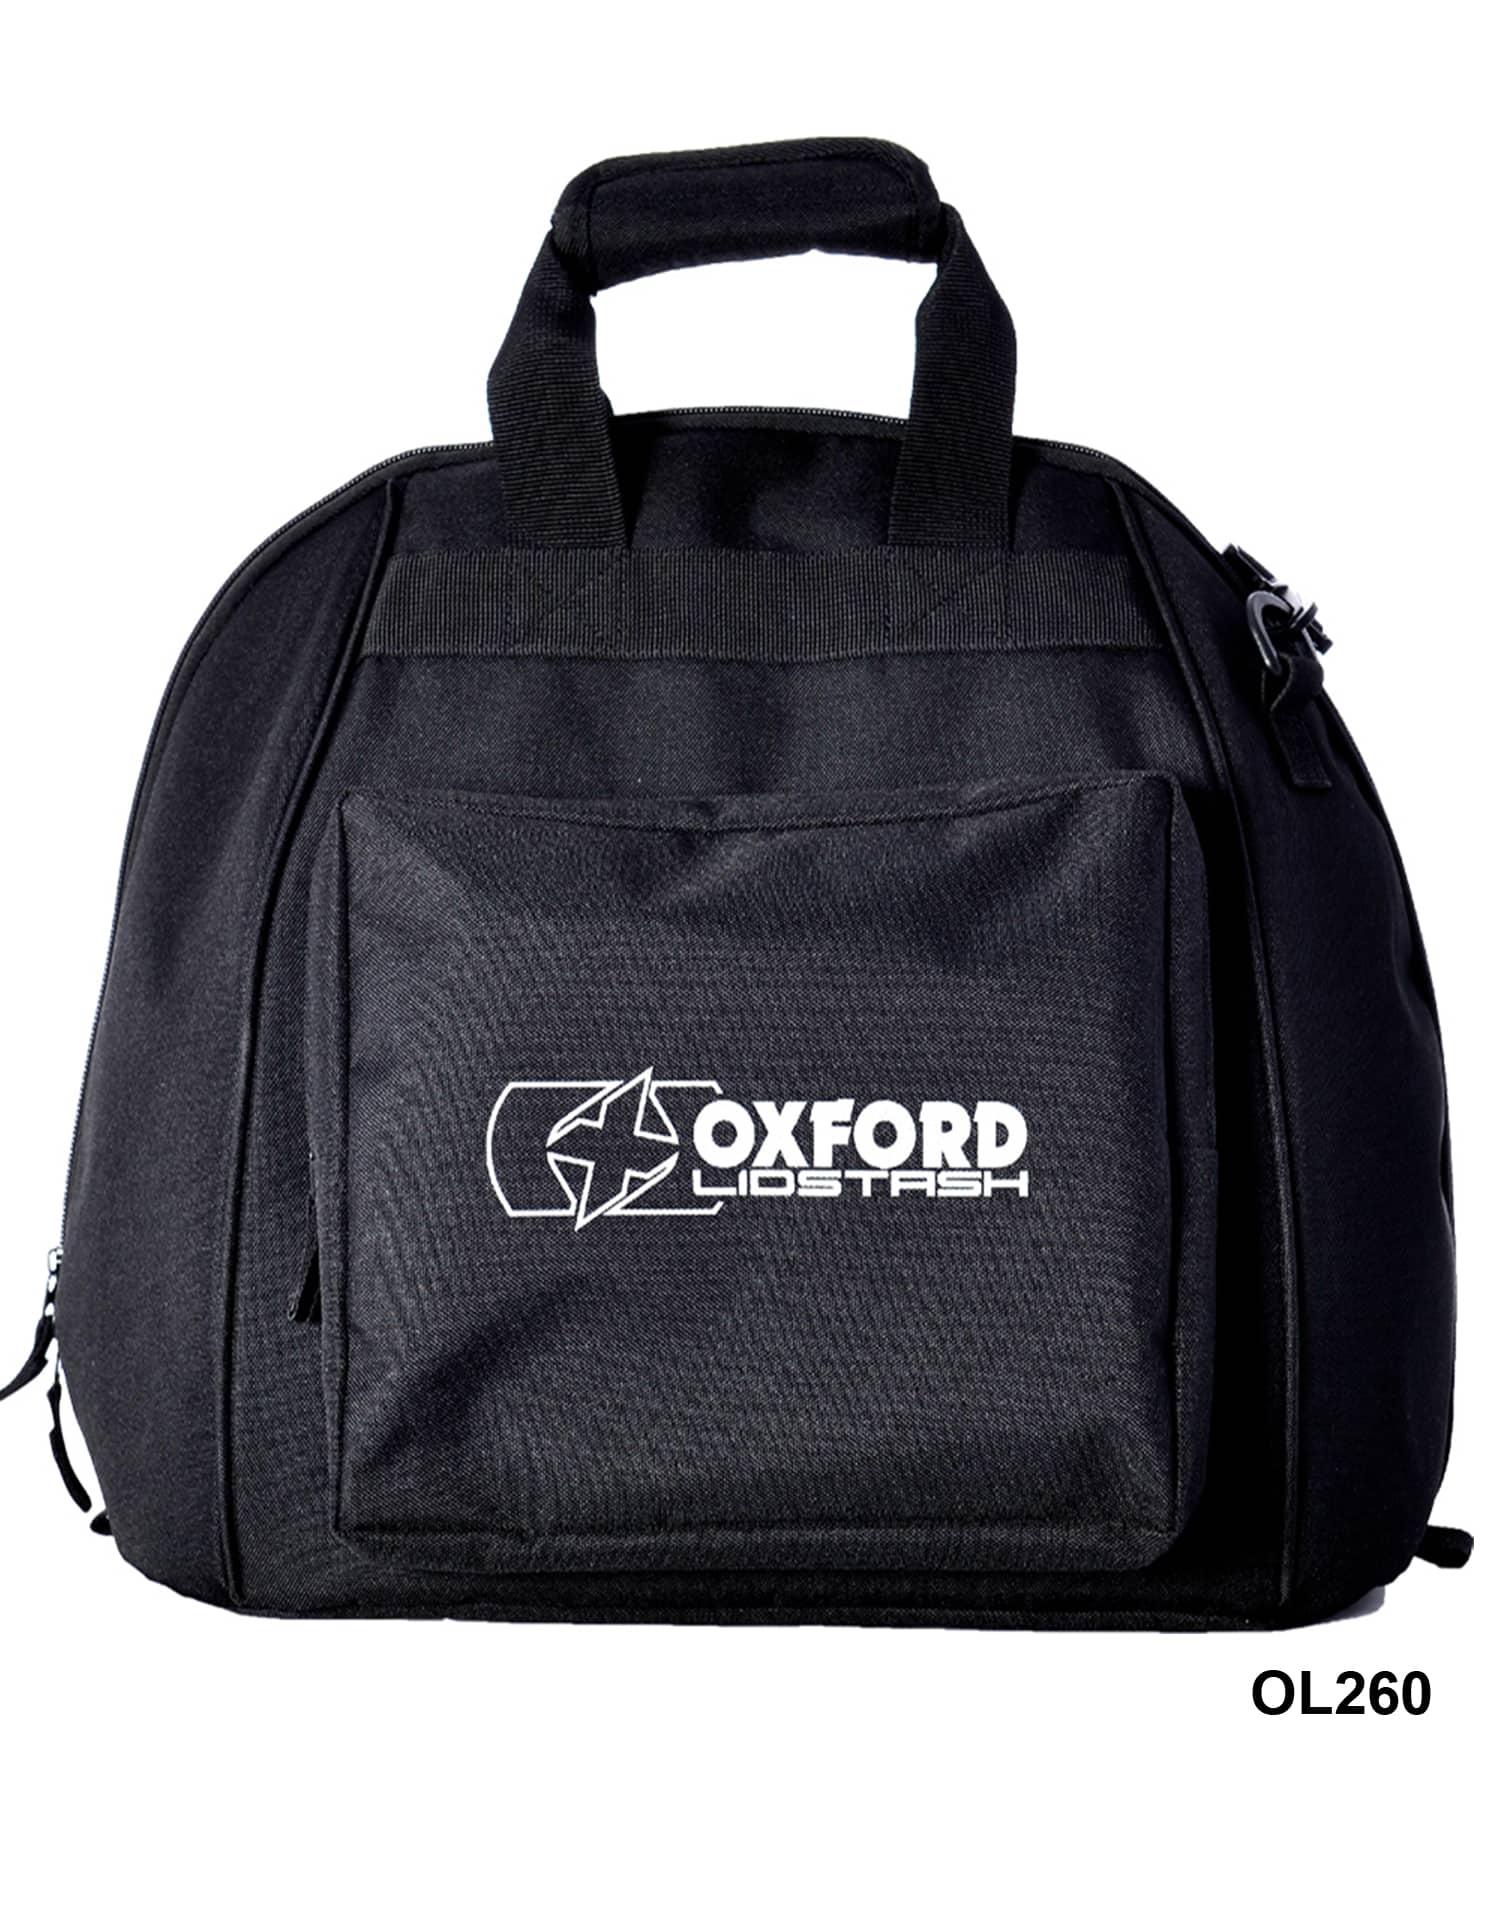 a32c27a477 Oxford Products Deluxe Fleece Lined LidStash Helmet Bag - OL260